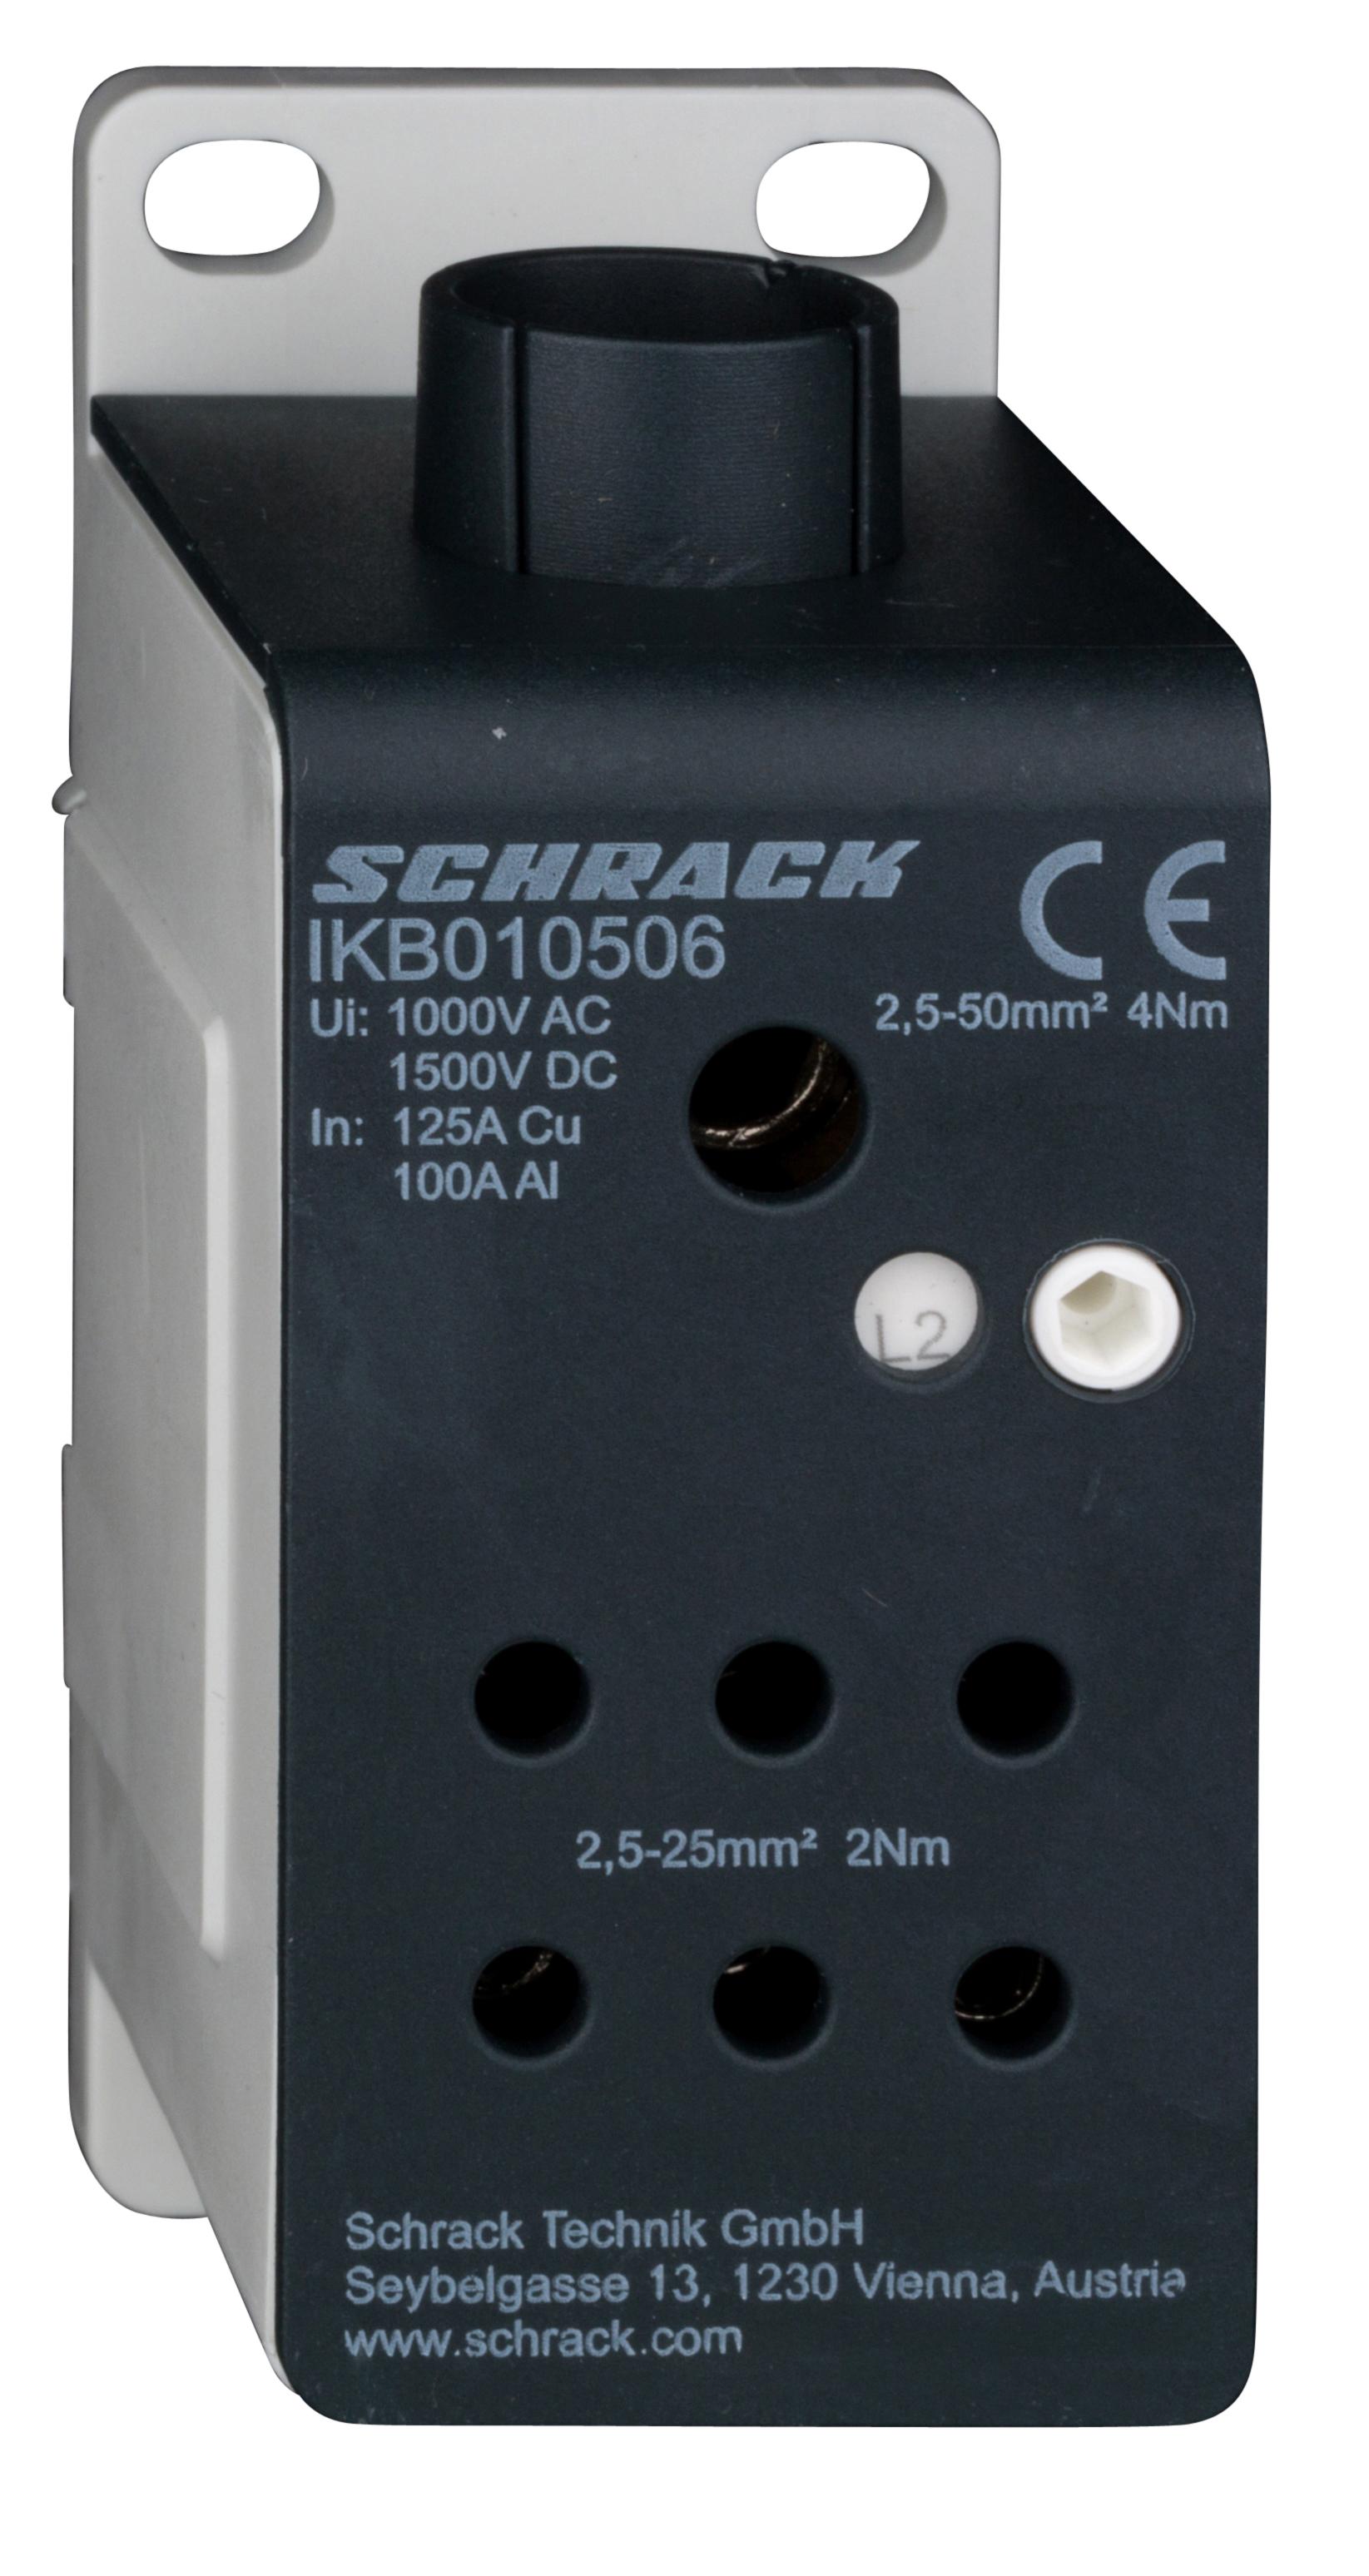 1 Stk ALU -Anschlussblock, 1-polig, 125A, zu 1x50mm², ab 6x25mm² IKB010506-